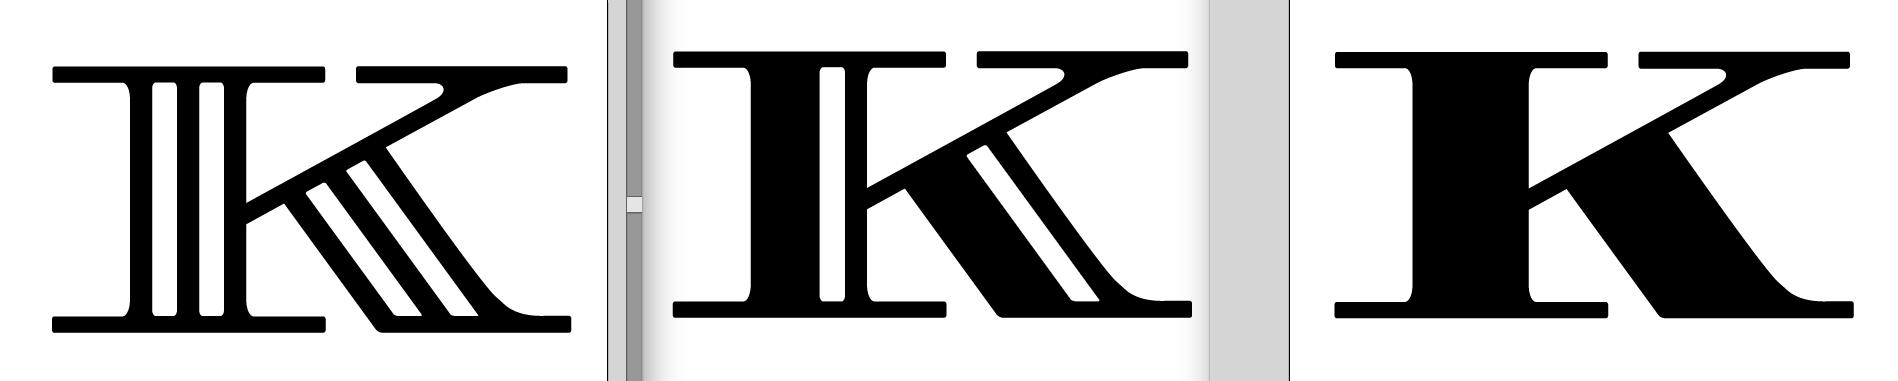 kolibree sneak peak